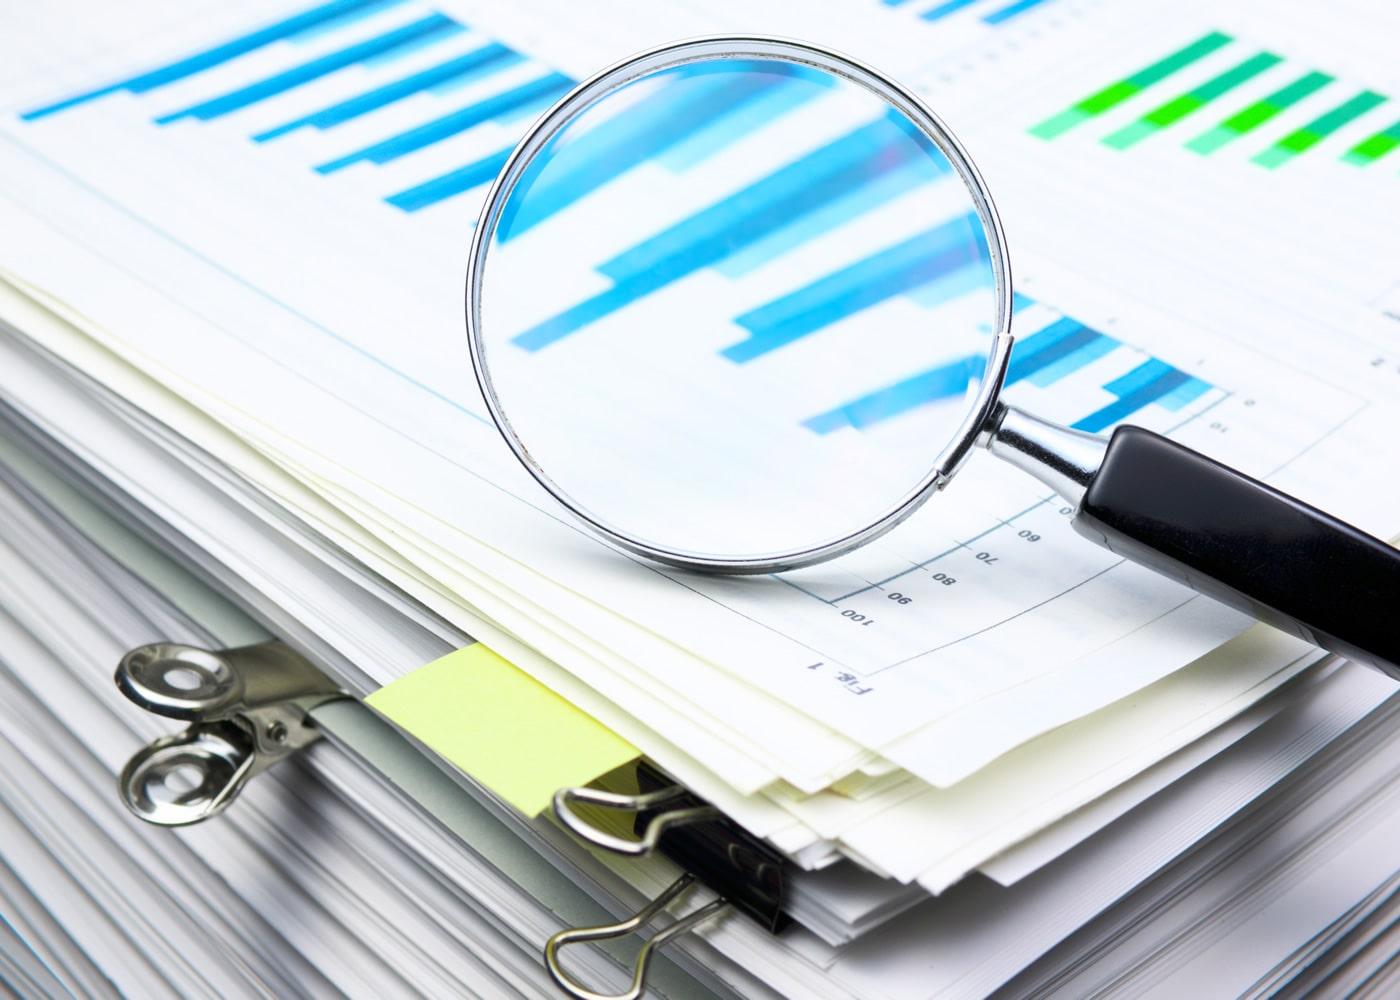 naem-2011-analyzing-data-scanning-business-documents-magnifying-700x500